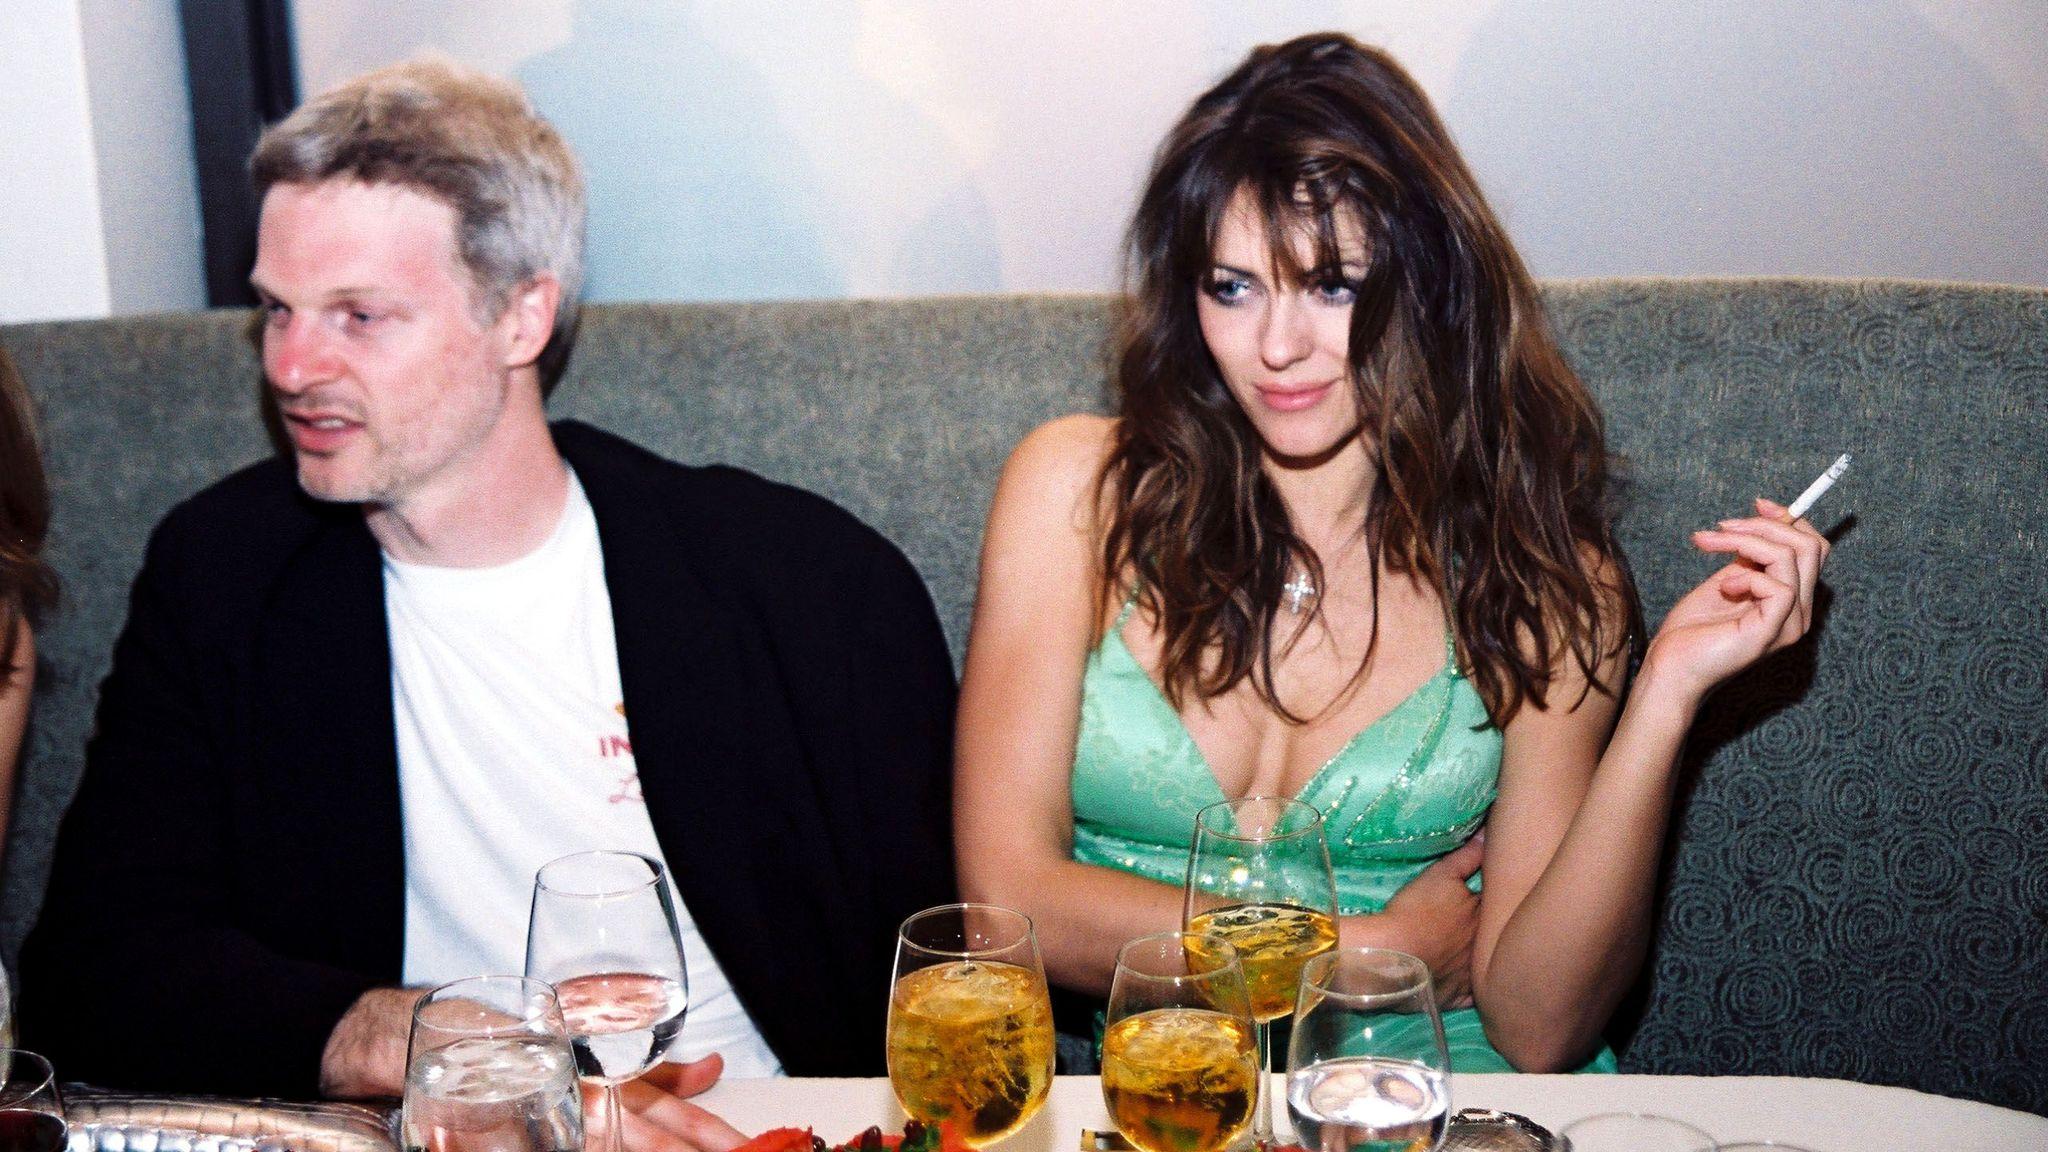 Steve Bing Film Producer And Ex Partner Of Liz Hurley Dies Aged 55 Ents Arts News Sky News